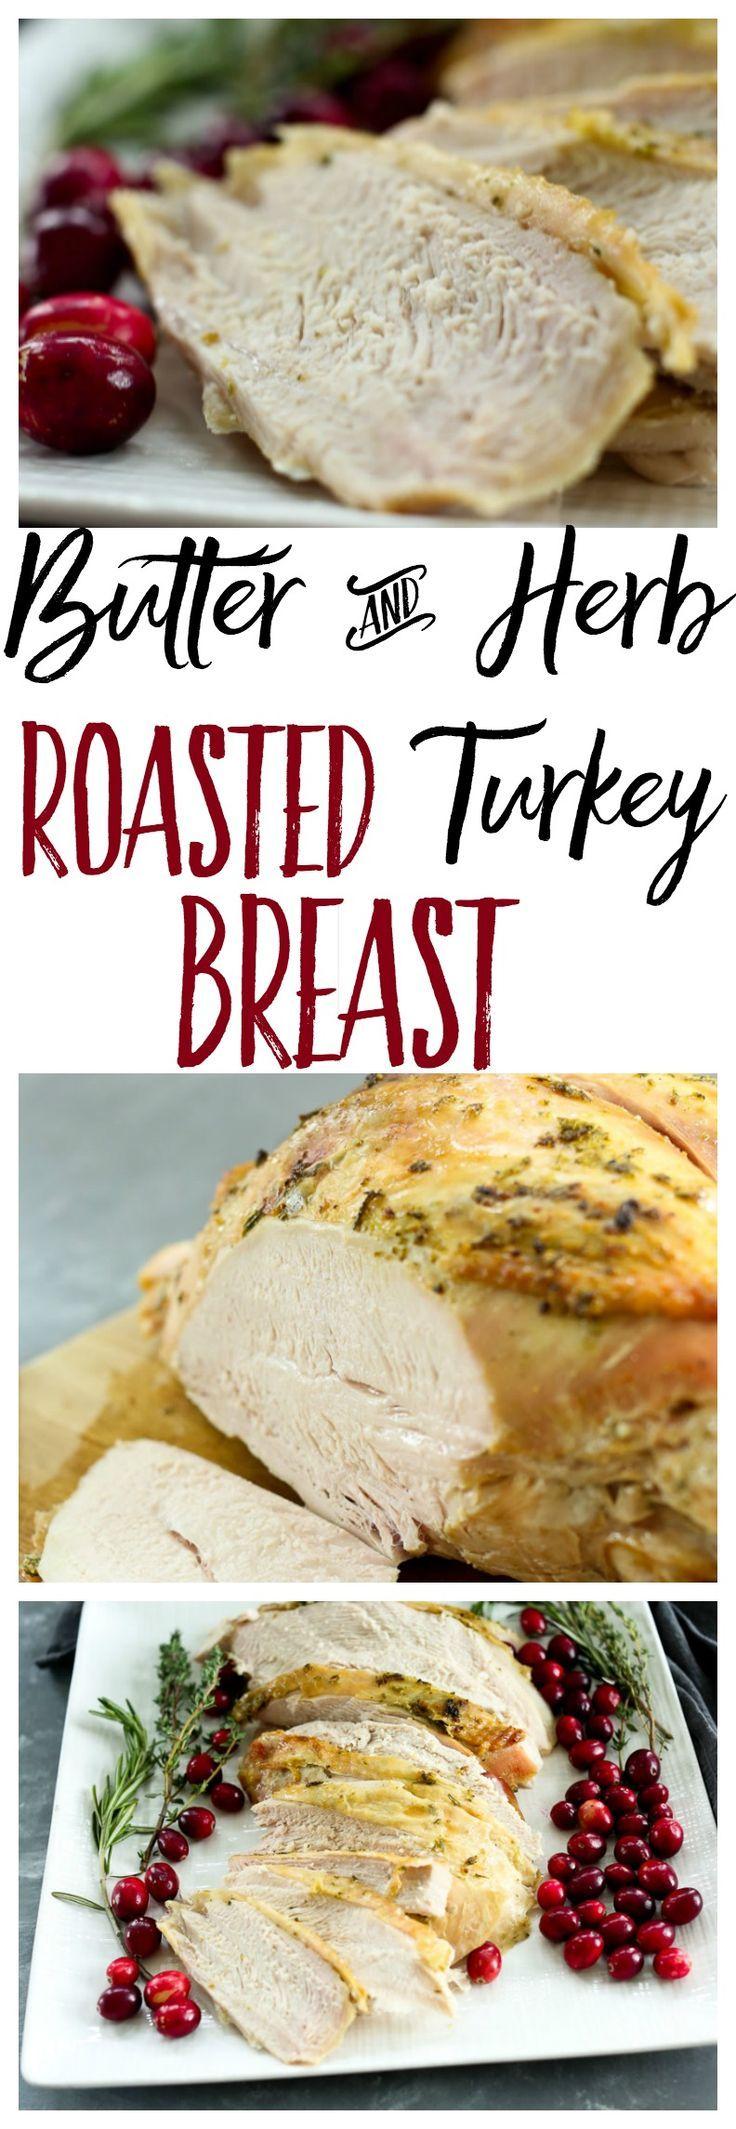 Roasted Turkey Breast recipe. #Christmasrecipes #Thanksgivingrecipes #entertaining #holidayfood #Christmasdinner via @Maryea Flaherty